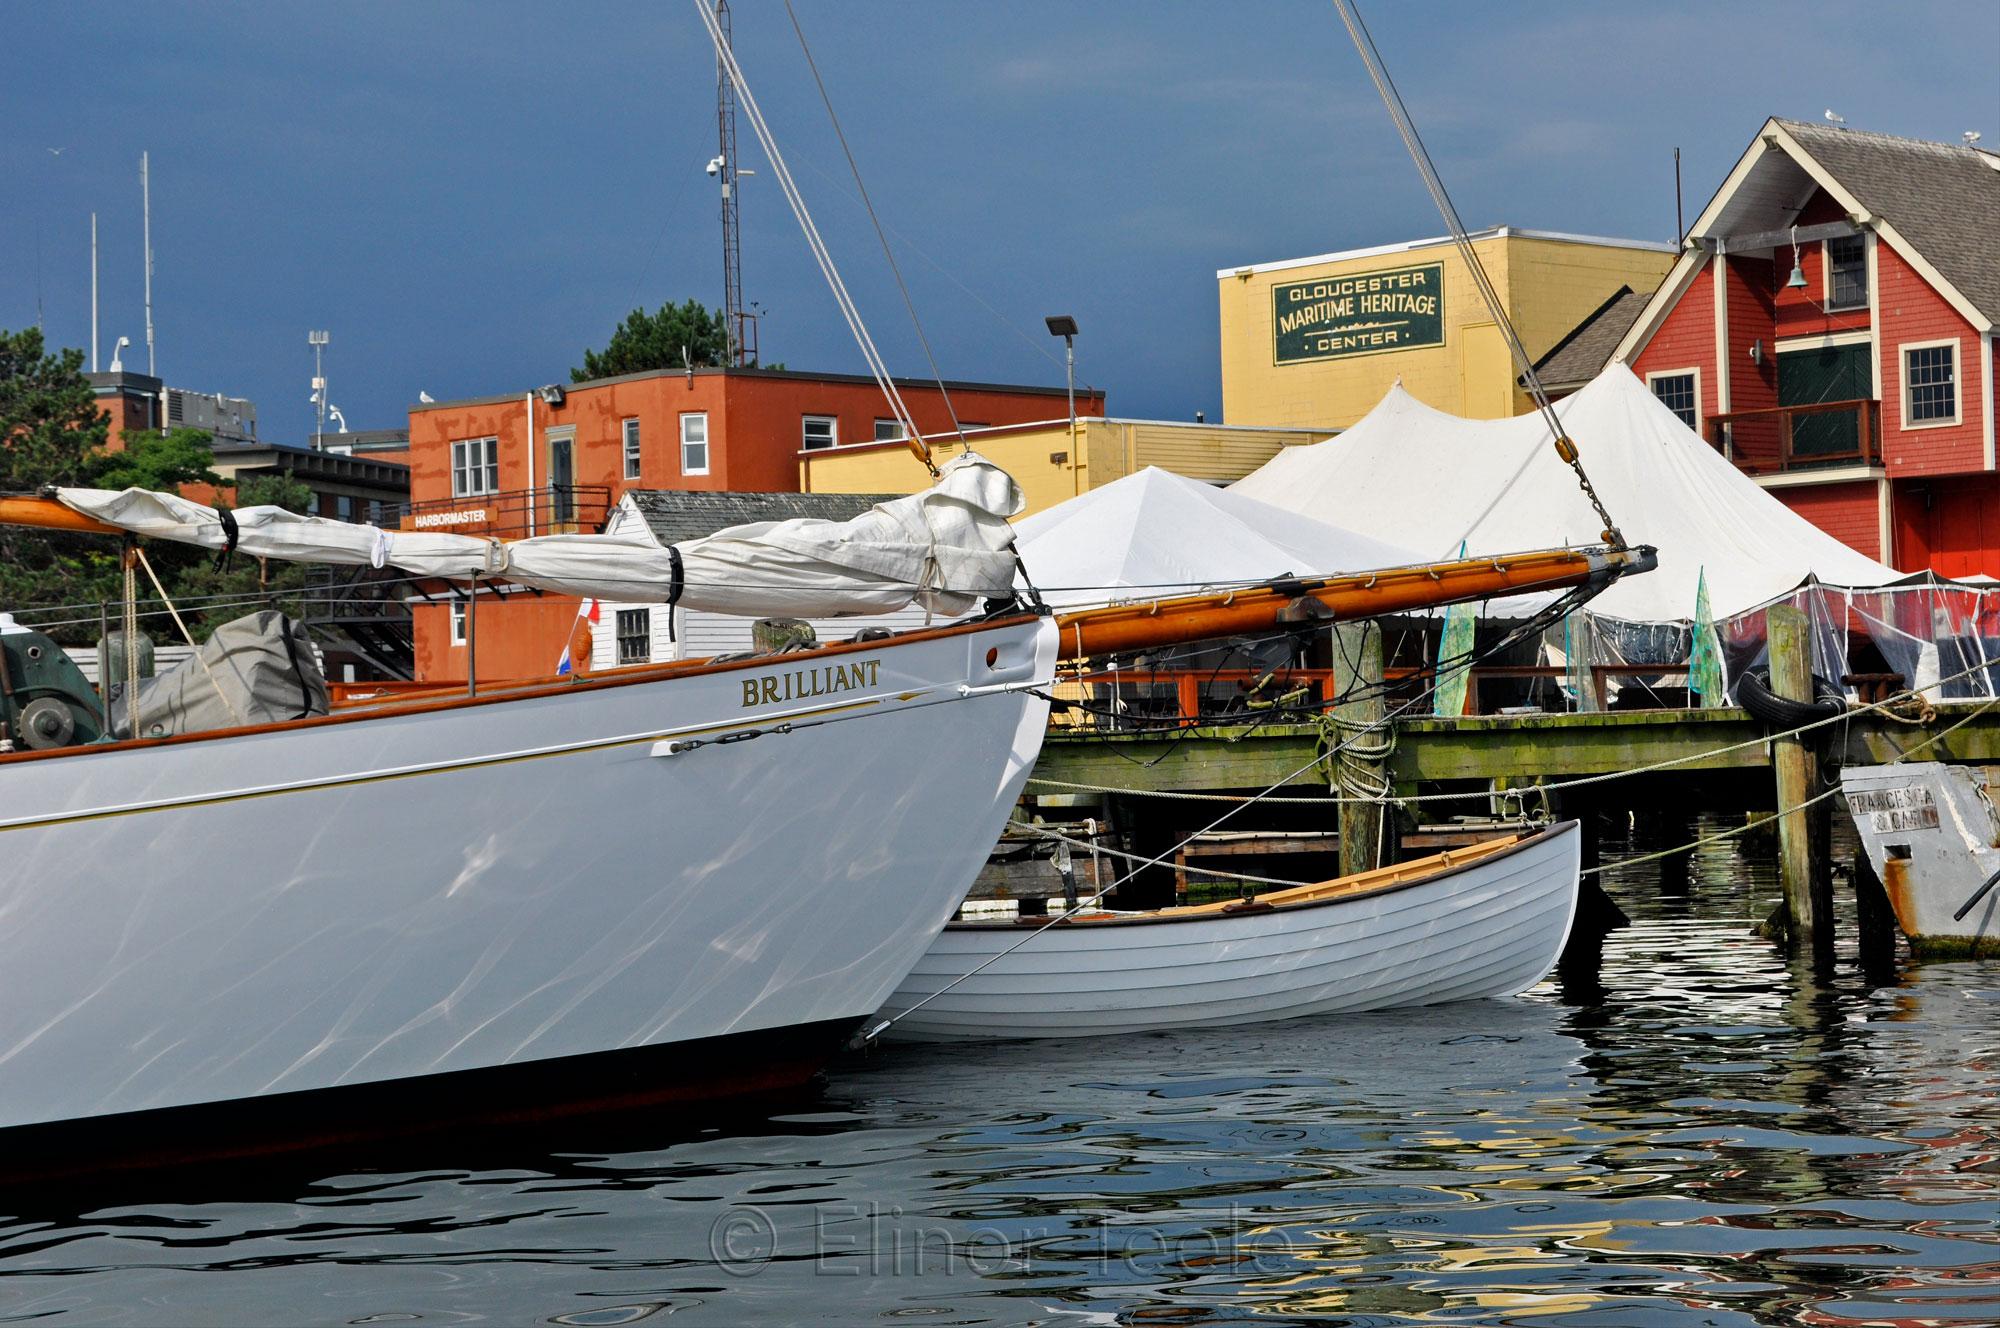 Schooner Festival 2013 Brilliant and Maritime Heritage Center